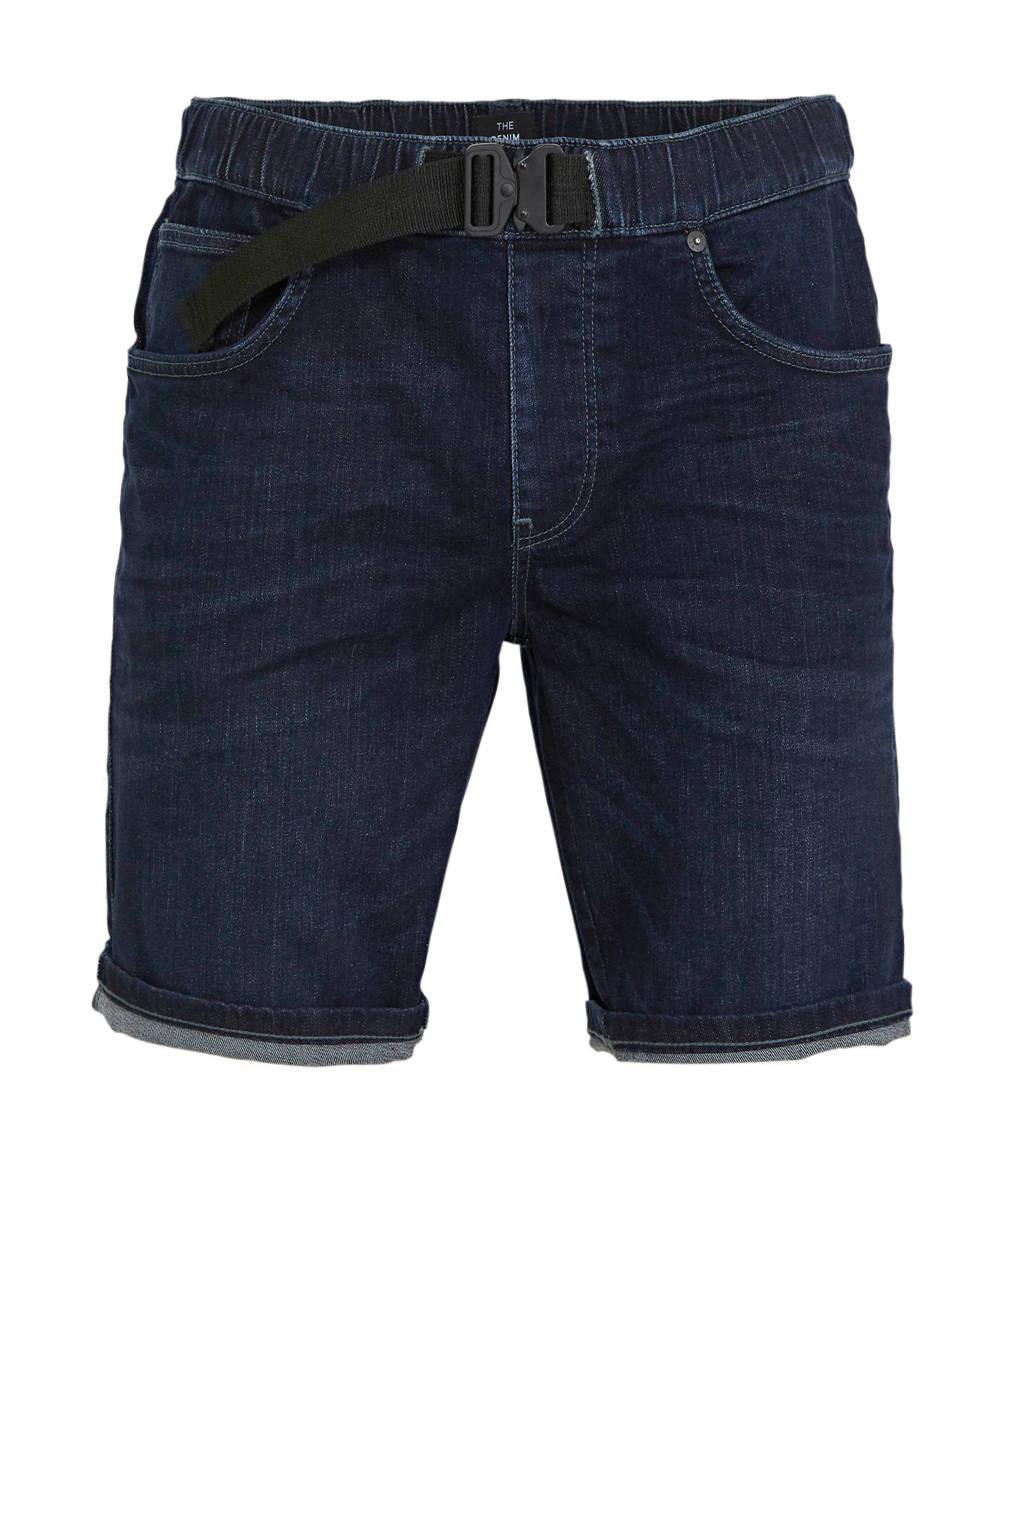 C&A The Denim regular fit jeans short donkerblauw, Donkerblauw